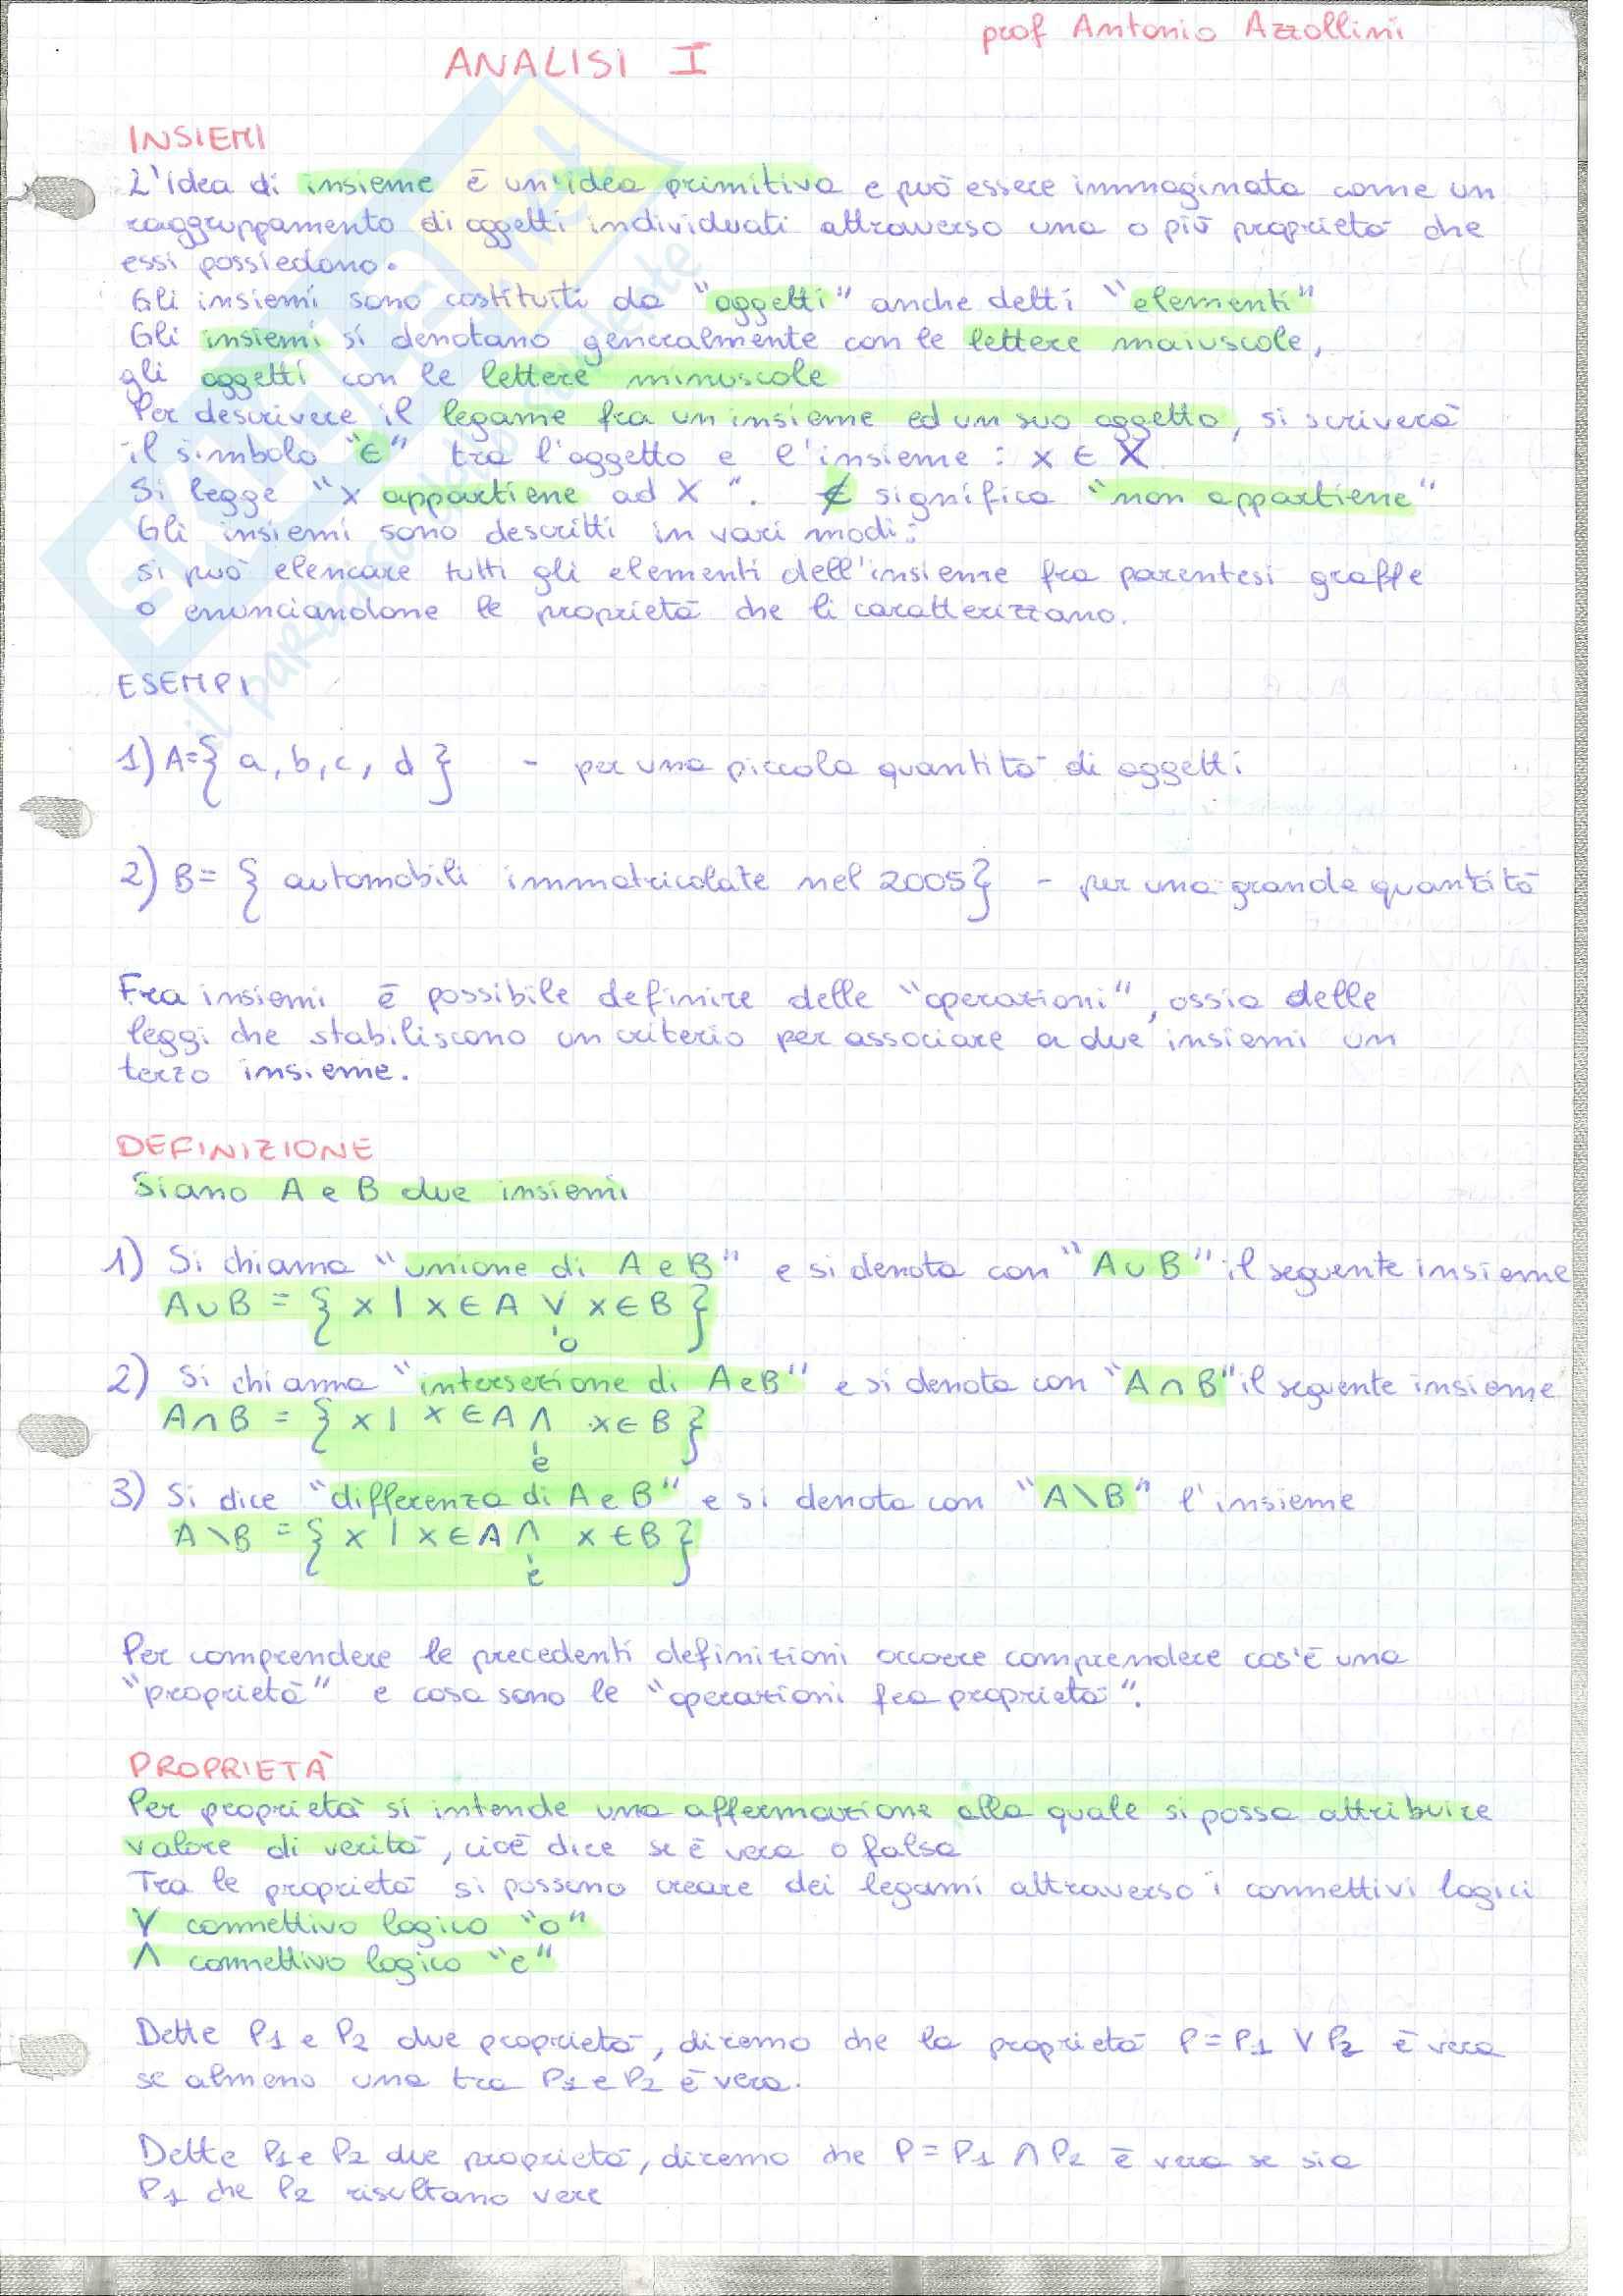 Appunti analisi matematica 1